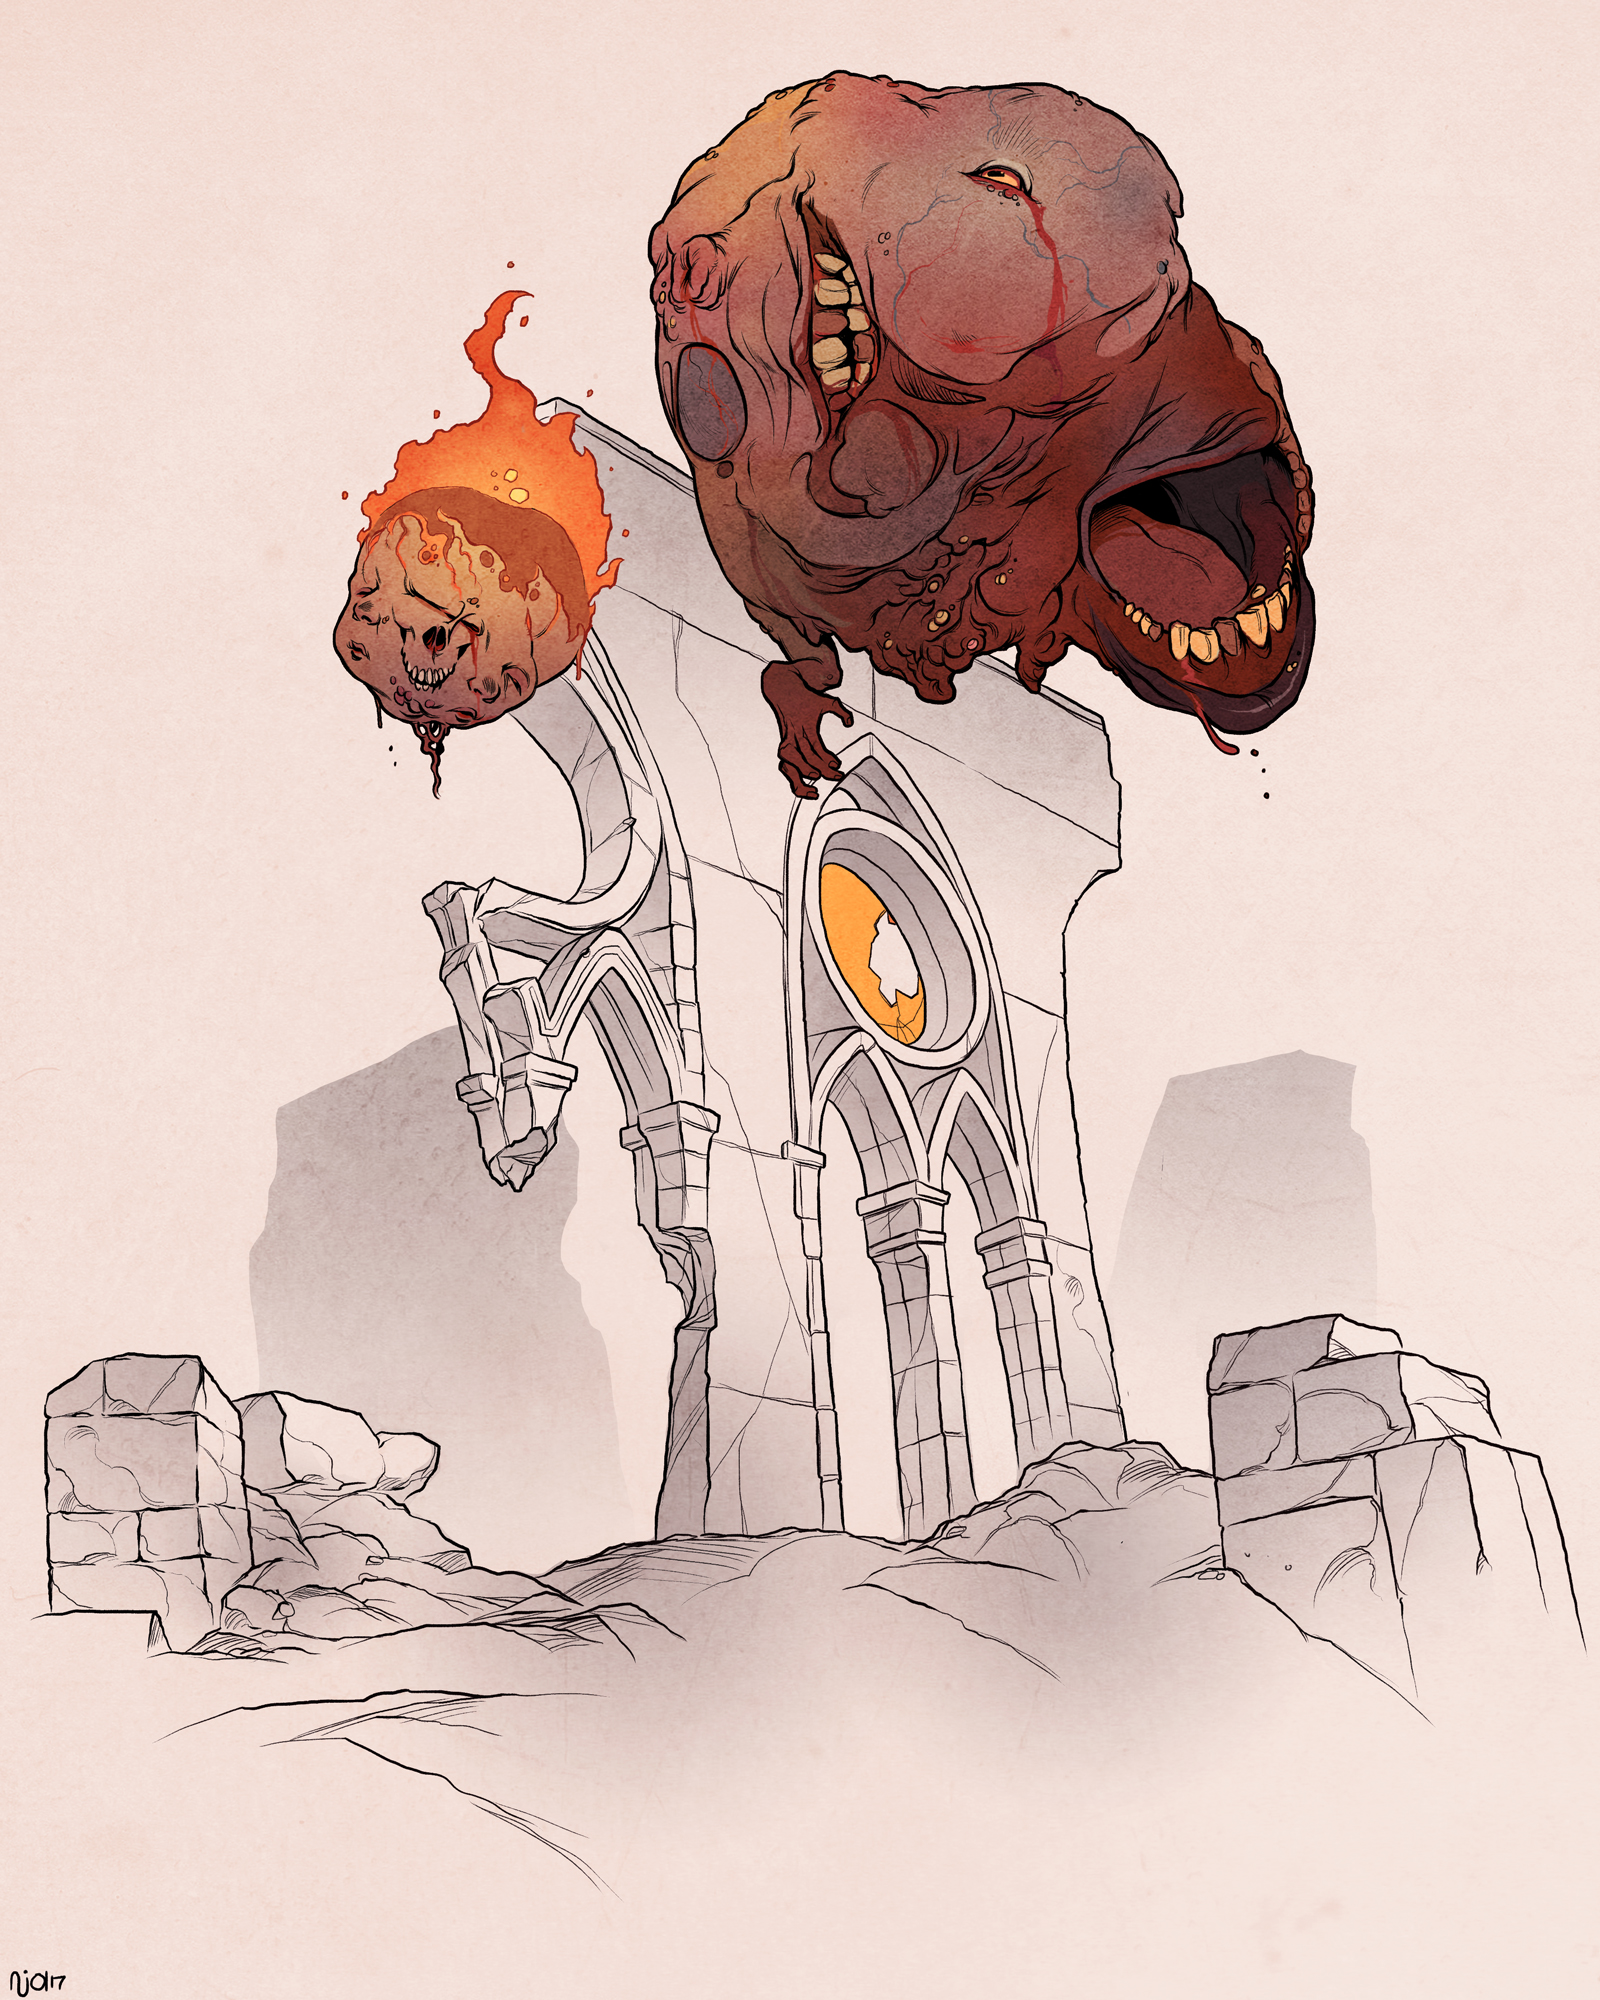 Lost Soul Doom Deviantart: DOOM: Lost Souls & Pain Elemental By Nathanandersonart On